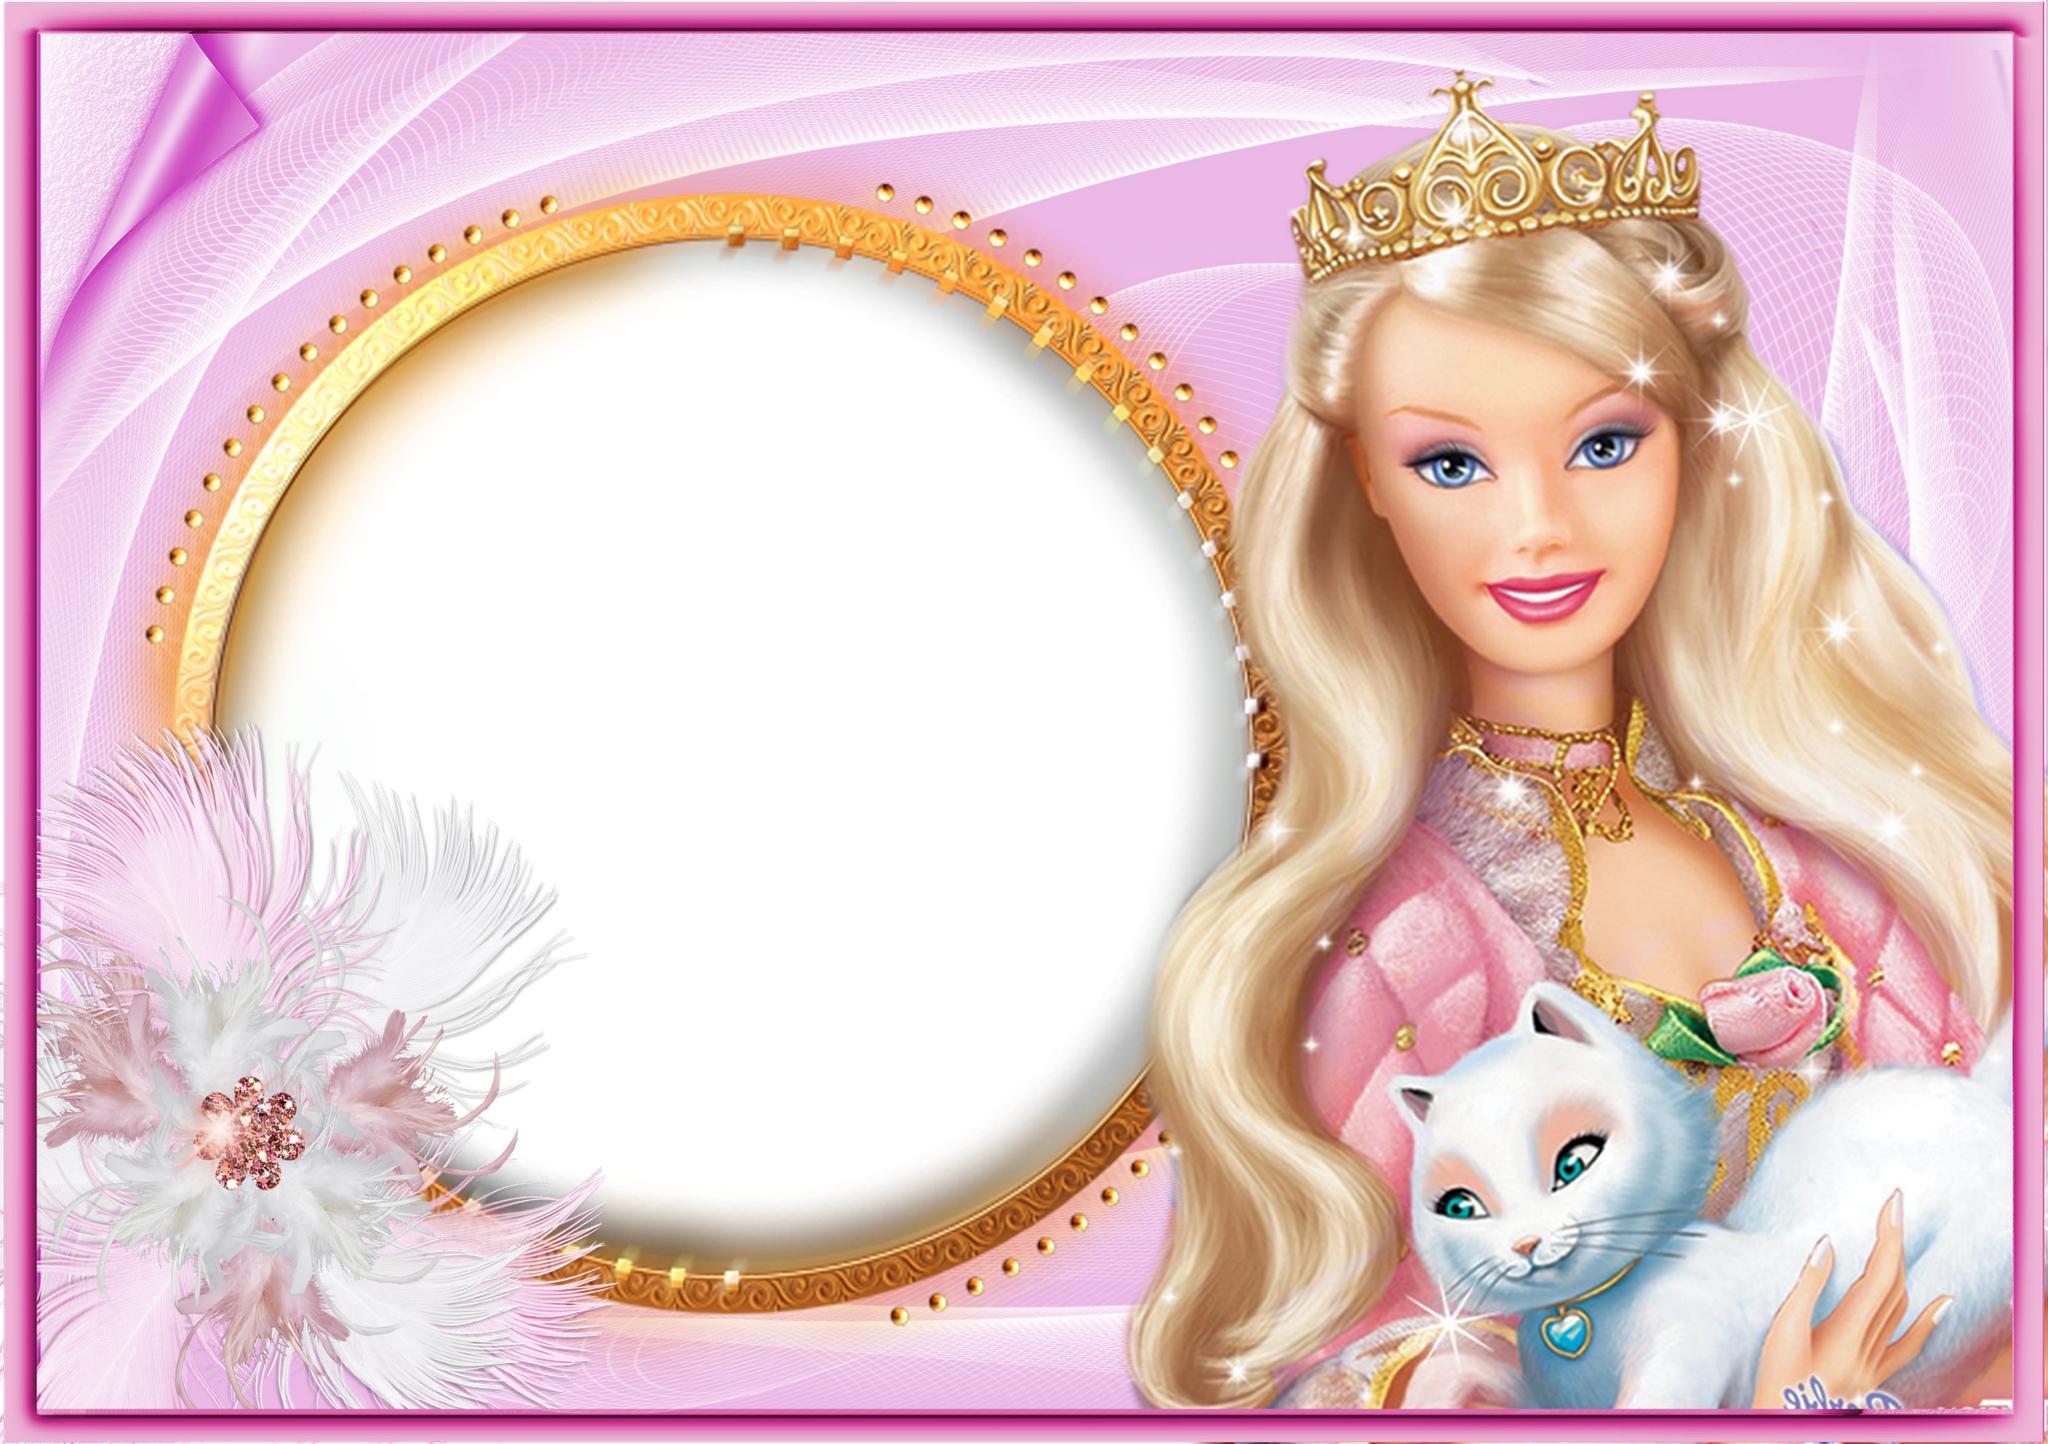 Wallpapers Download Cute Barbie Doll Long Hair Cute Barbie Doll In Winter Cap Full Hd Wallpaper